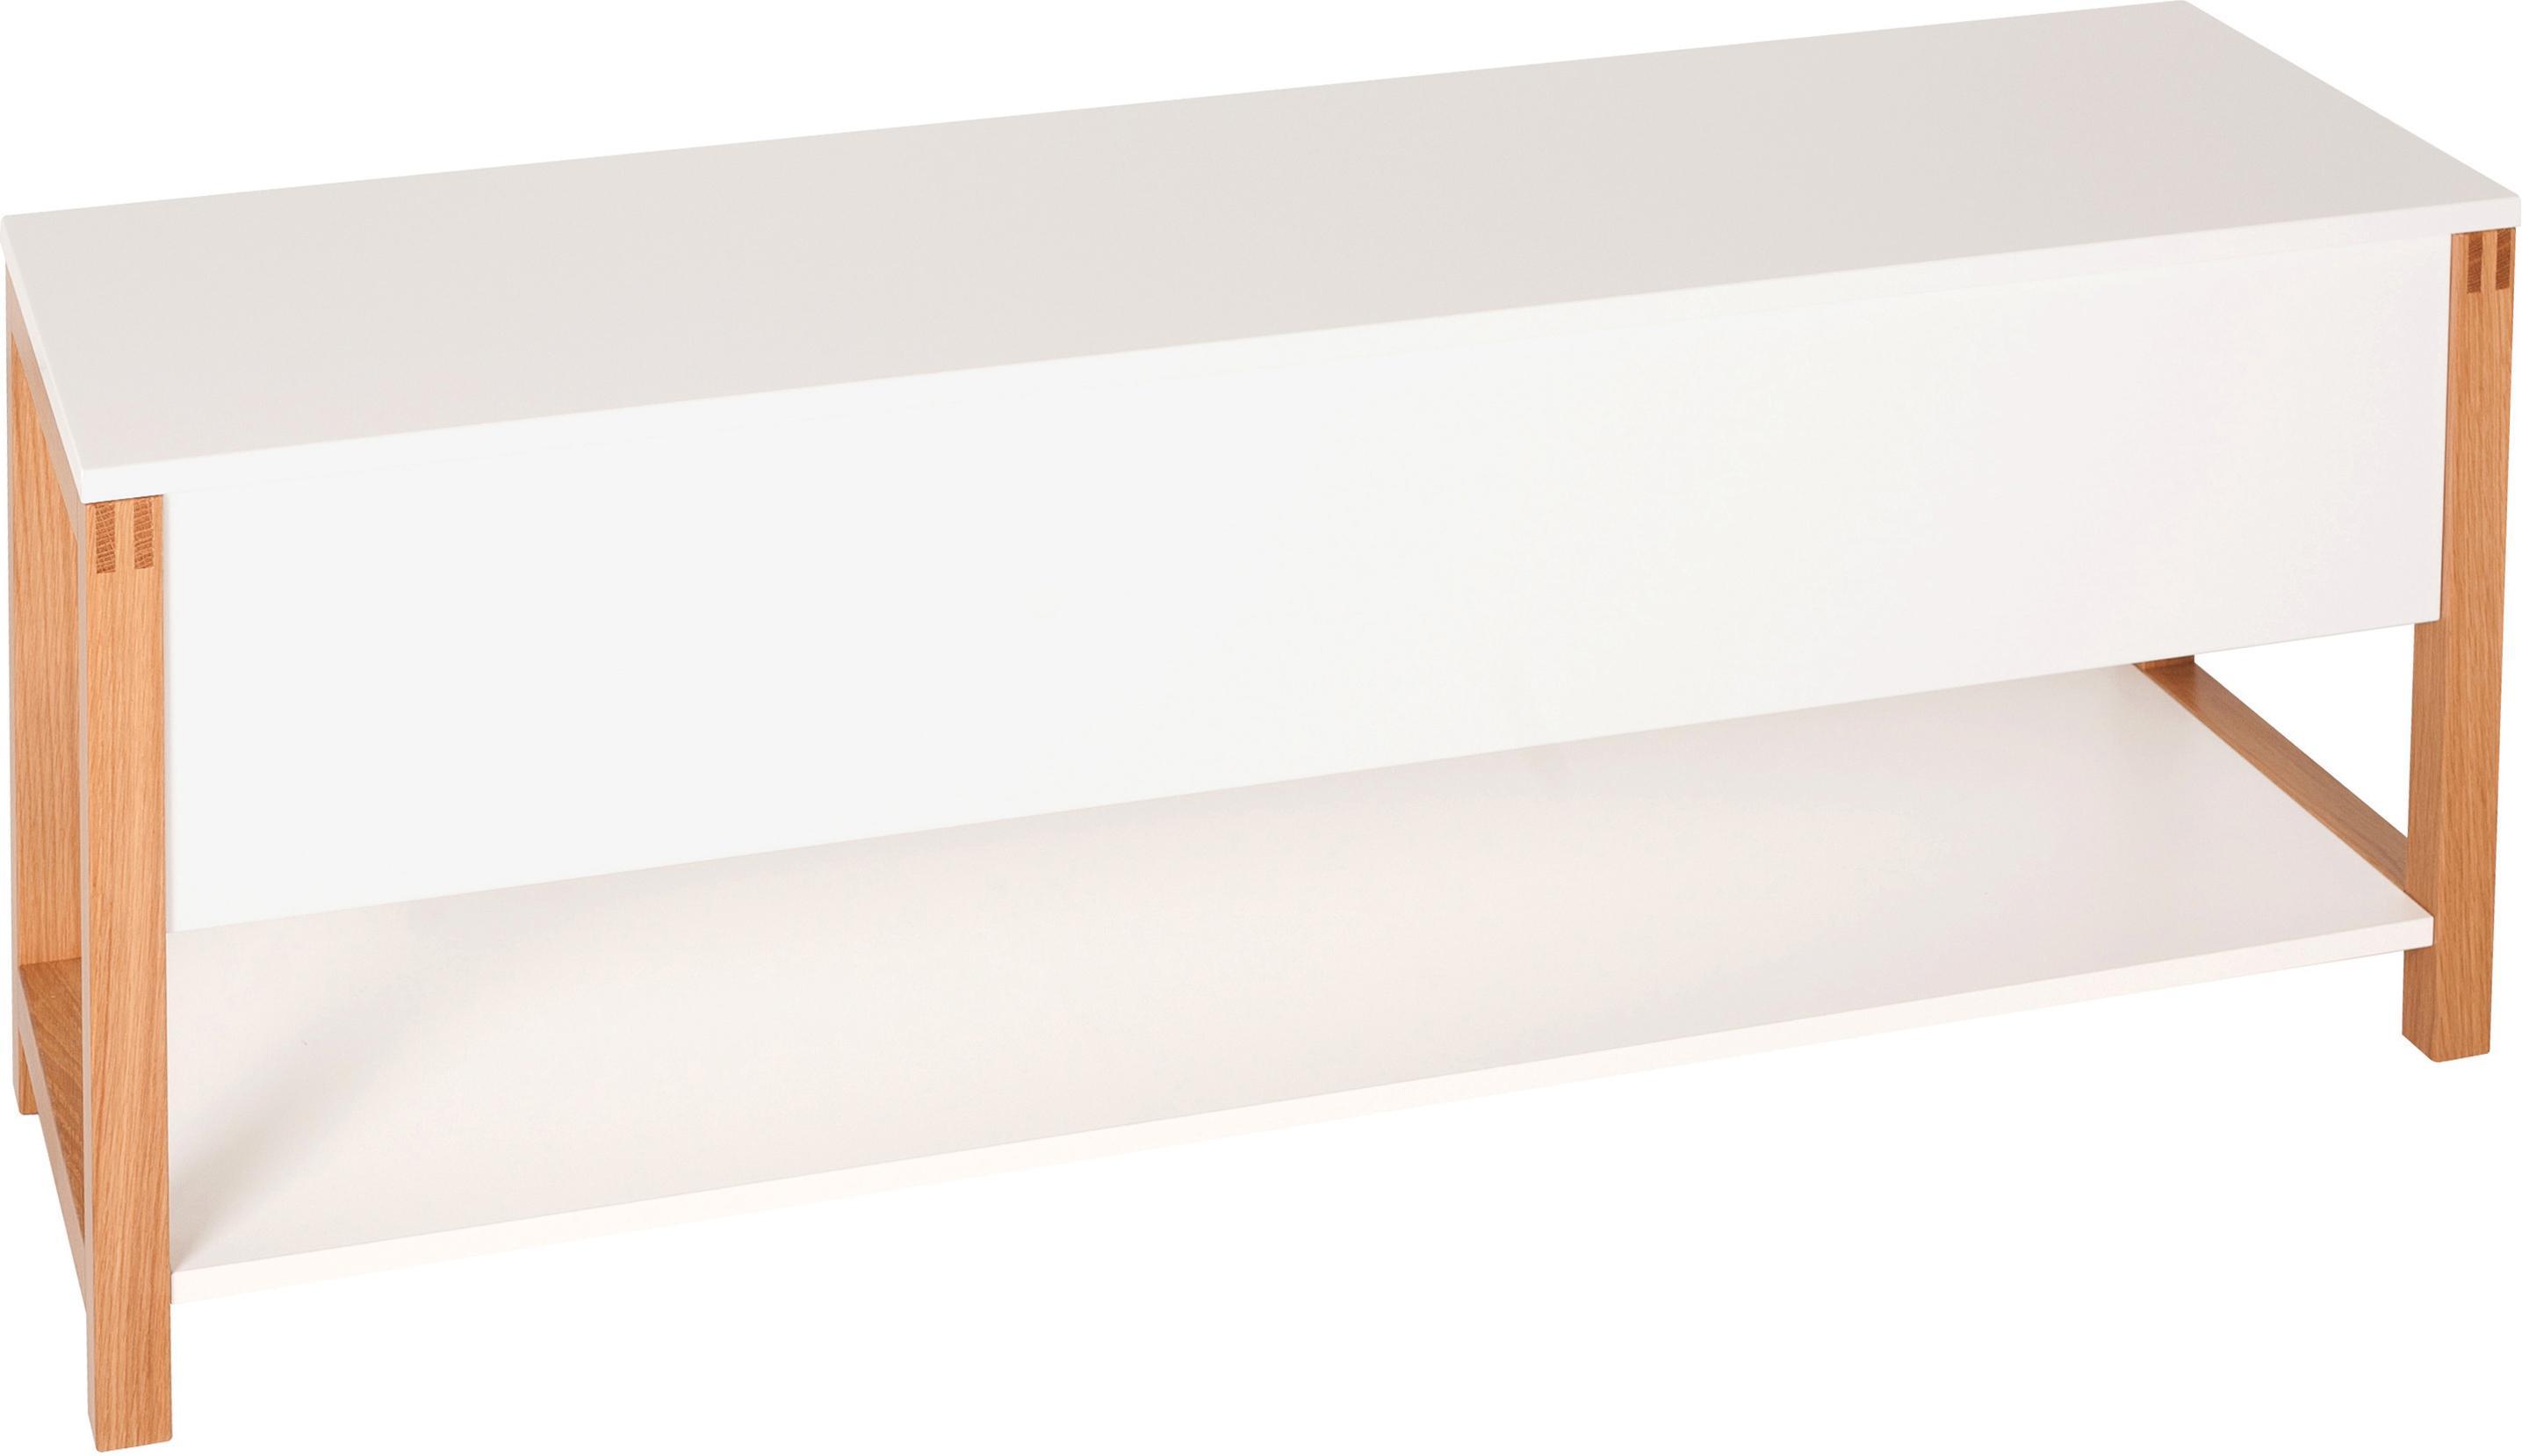 Schoenenbank Northgate met opbergruimte, Frame: eikenhout, Wit, 120 x 48 cm